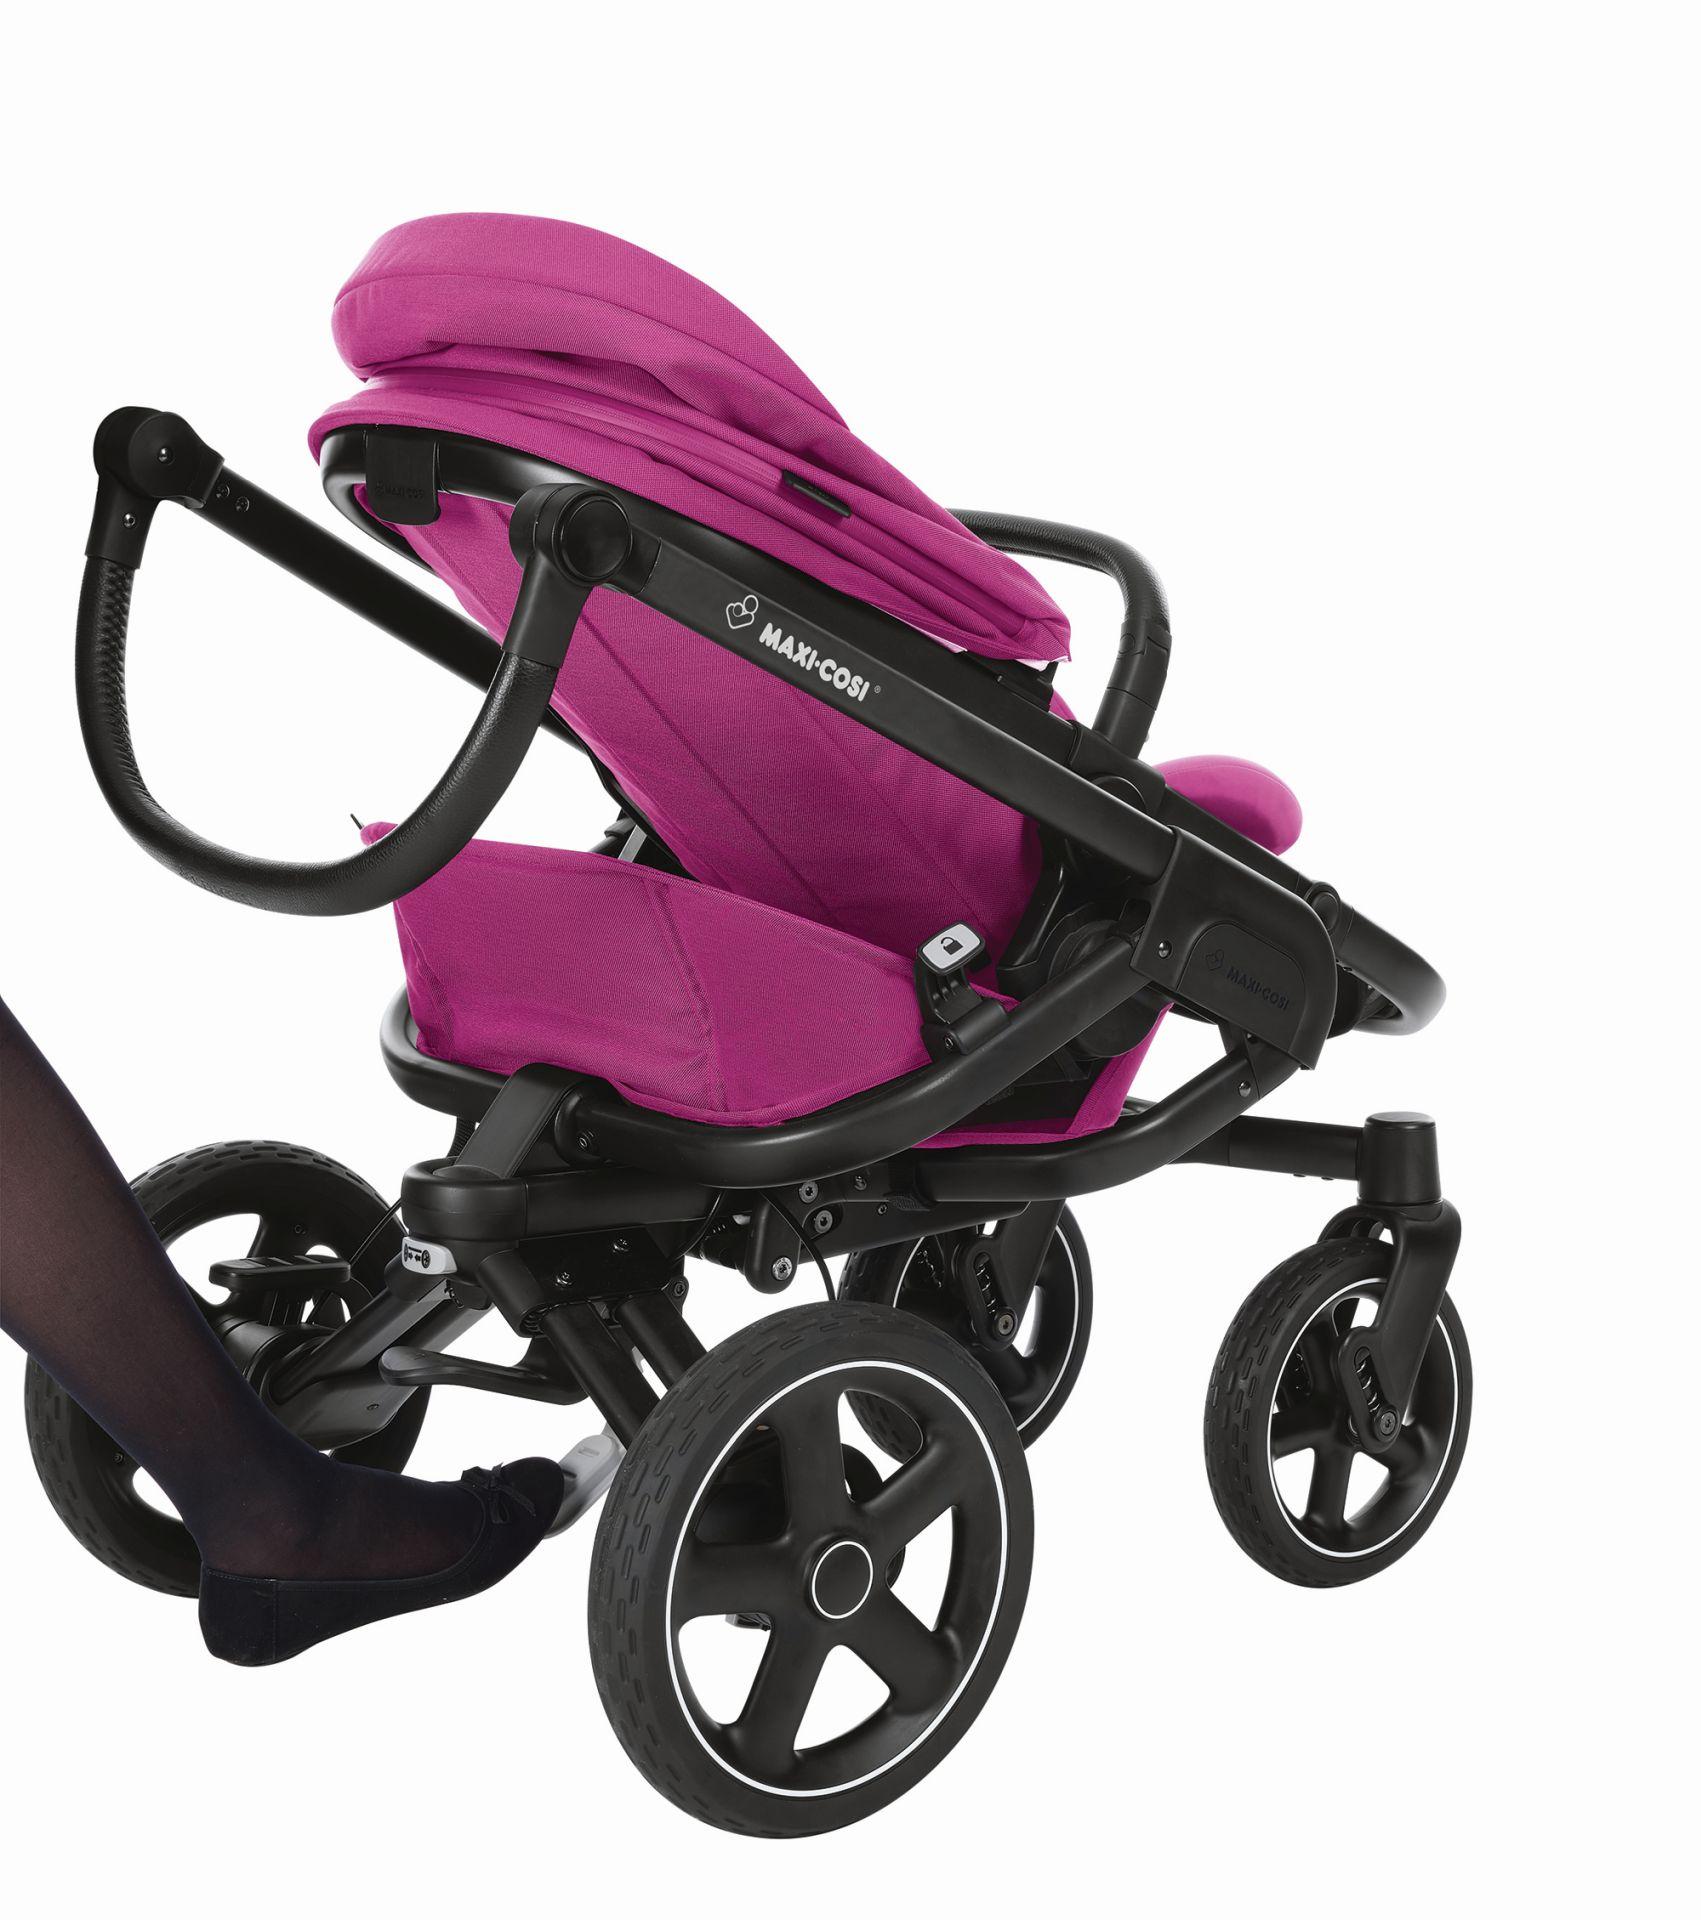 maxi cosi 4 wheels stroller nova 2018 frequency pink buy at kidsroom strollers. Black Bedroom Furniture Sets. Home Design Ideas